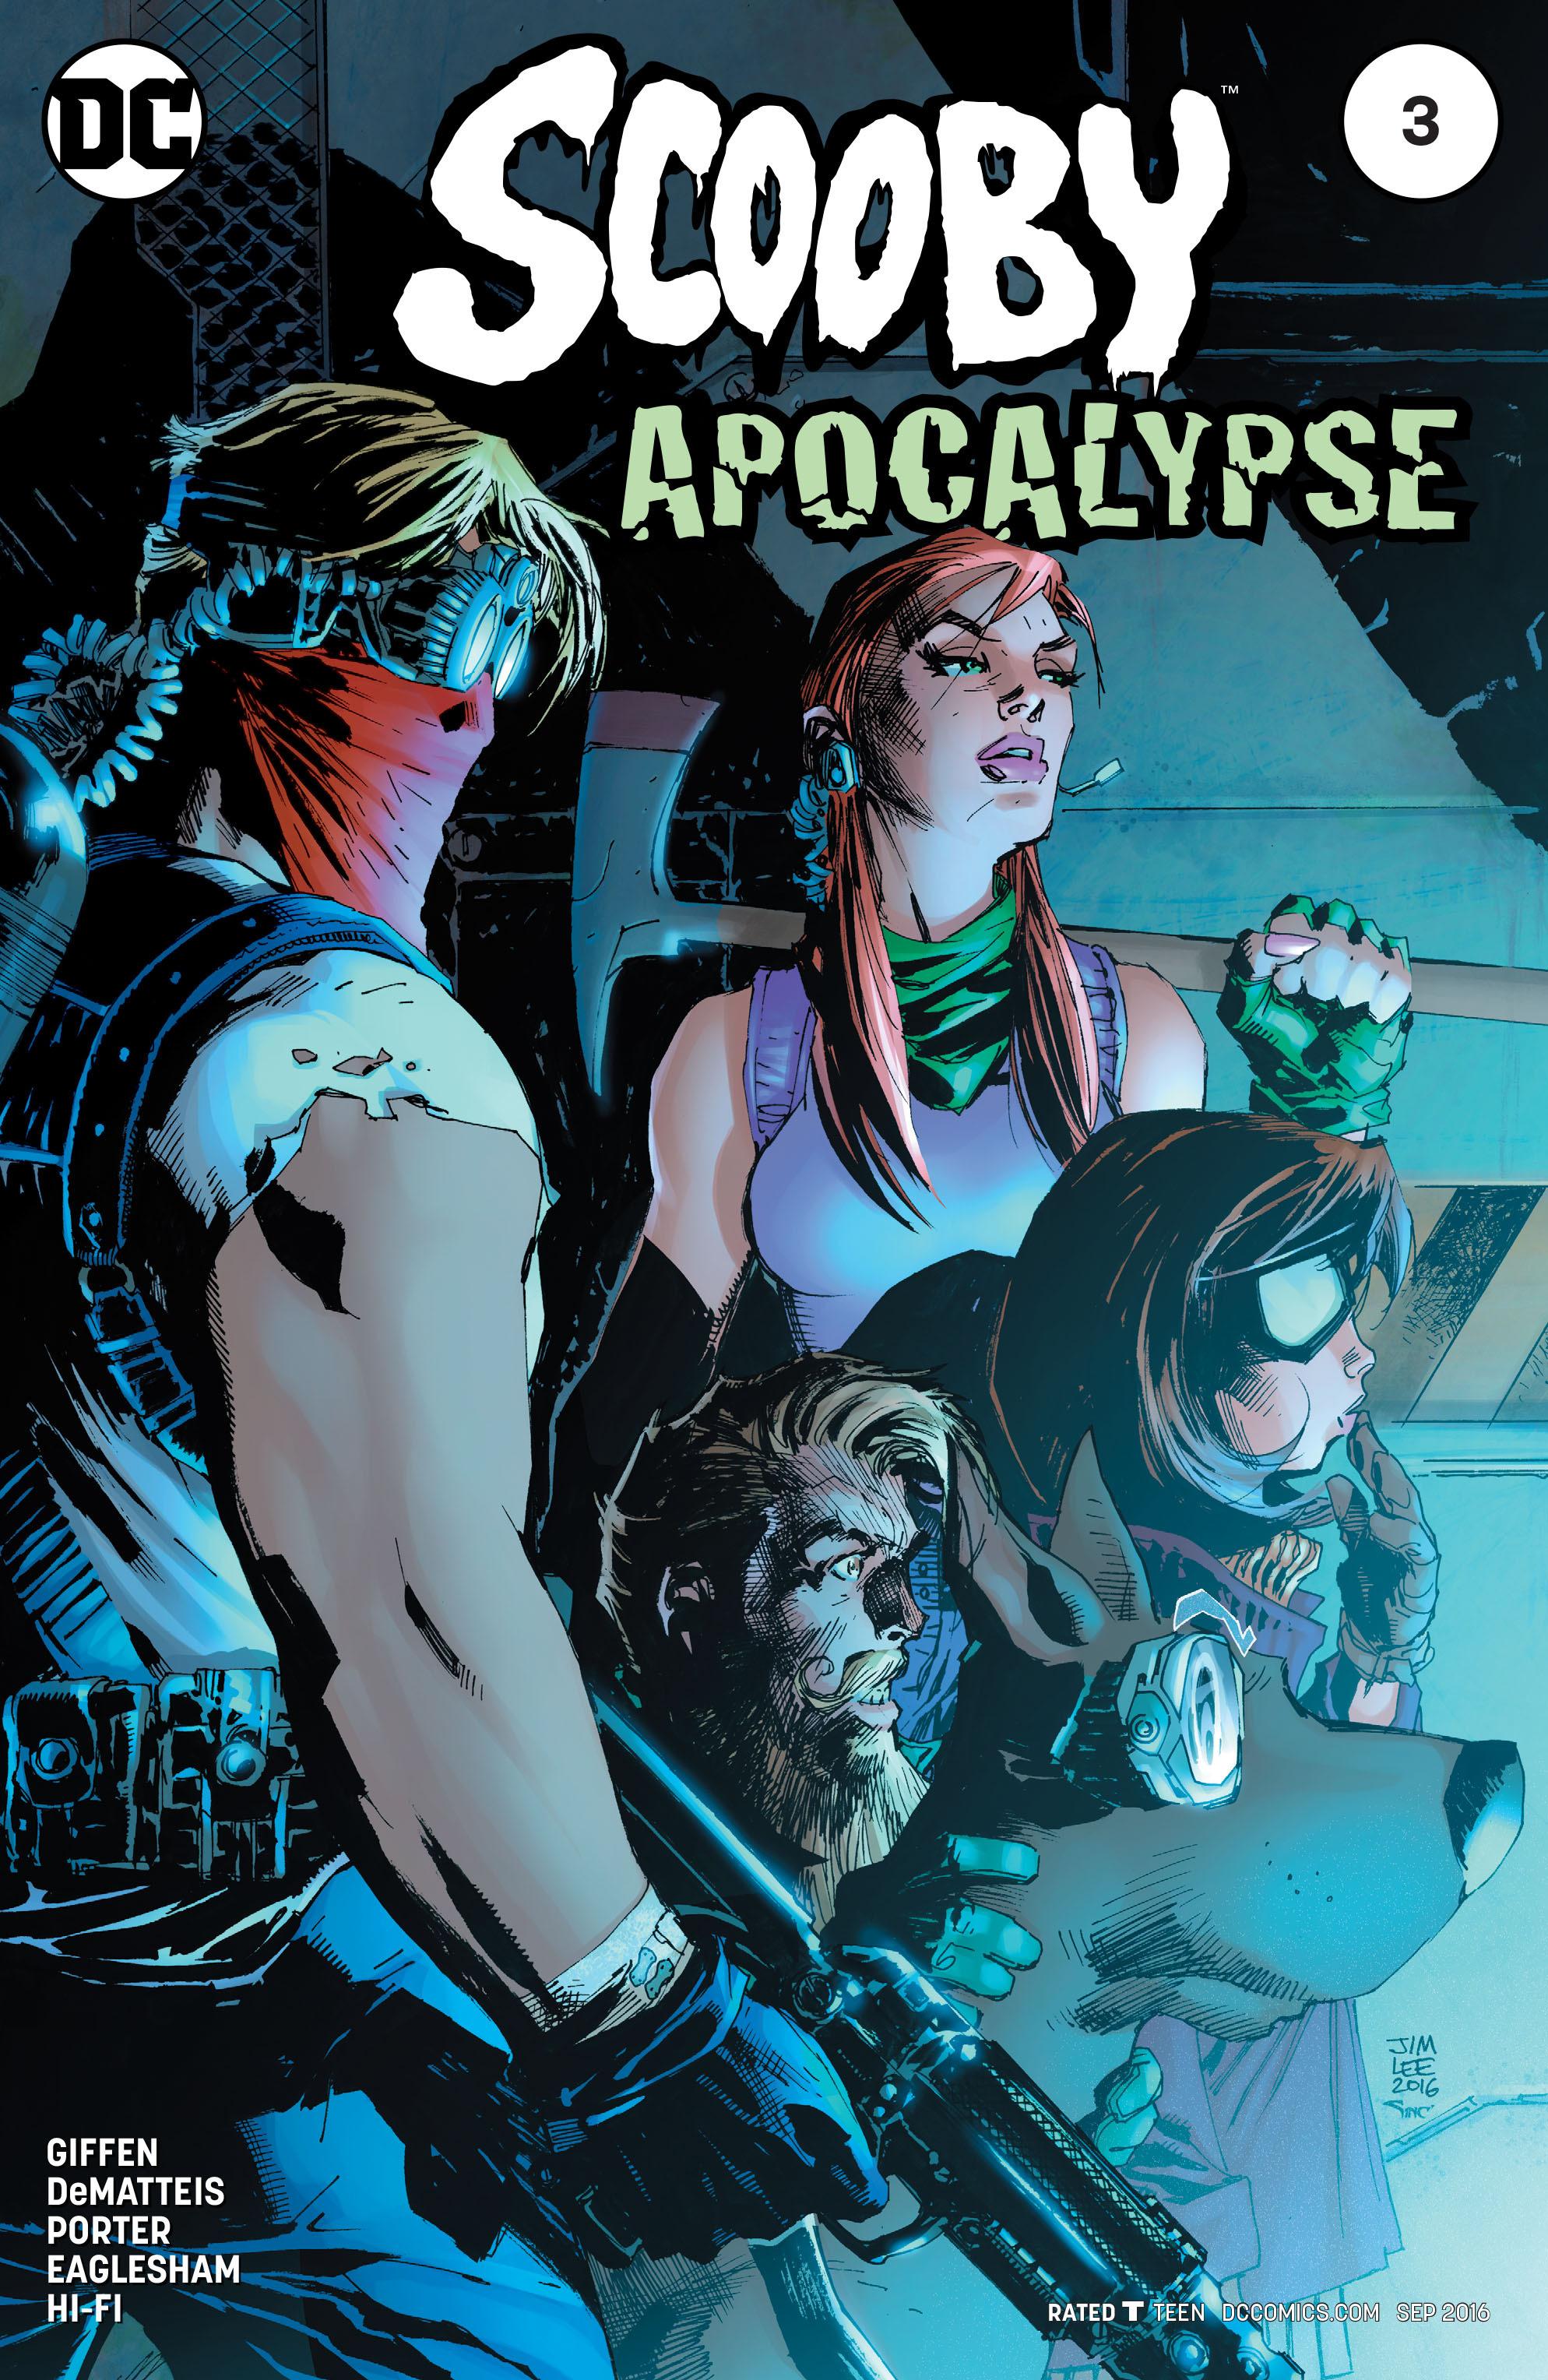 Read online Scooby Apocalypse comic -  Issue #3 - 1